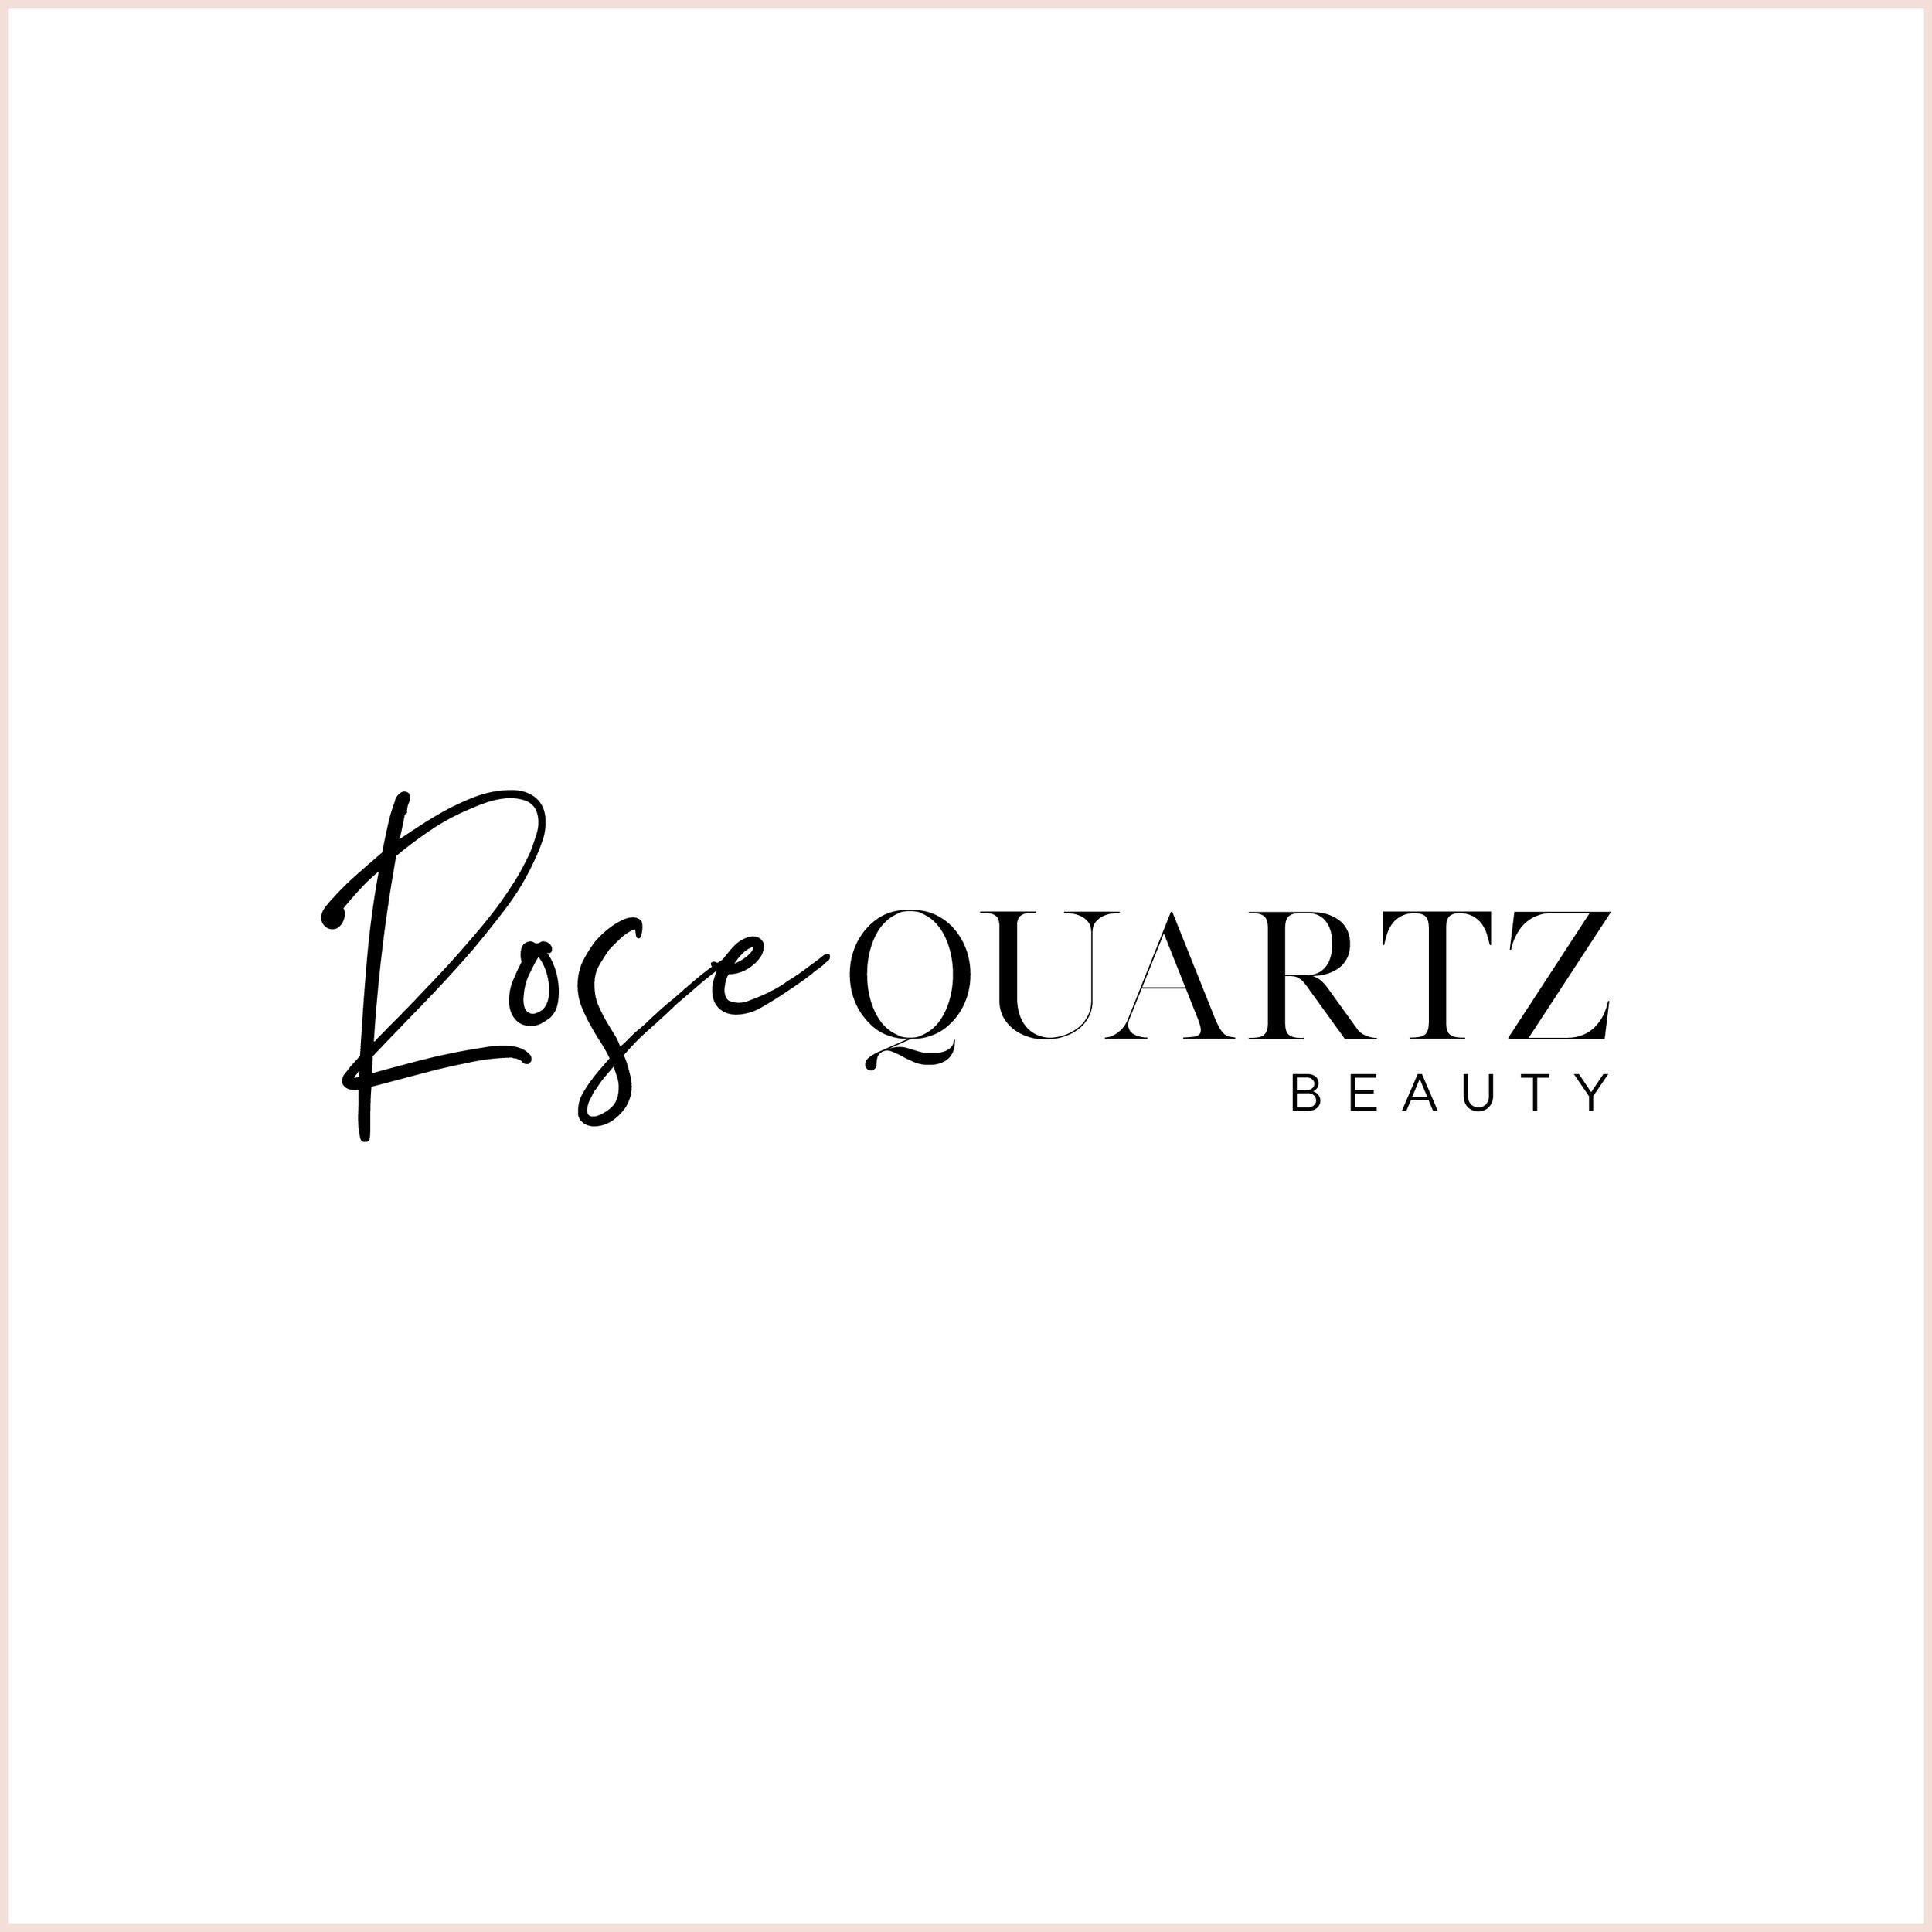 7-rosequartz.jpg